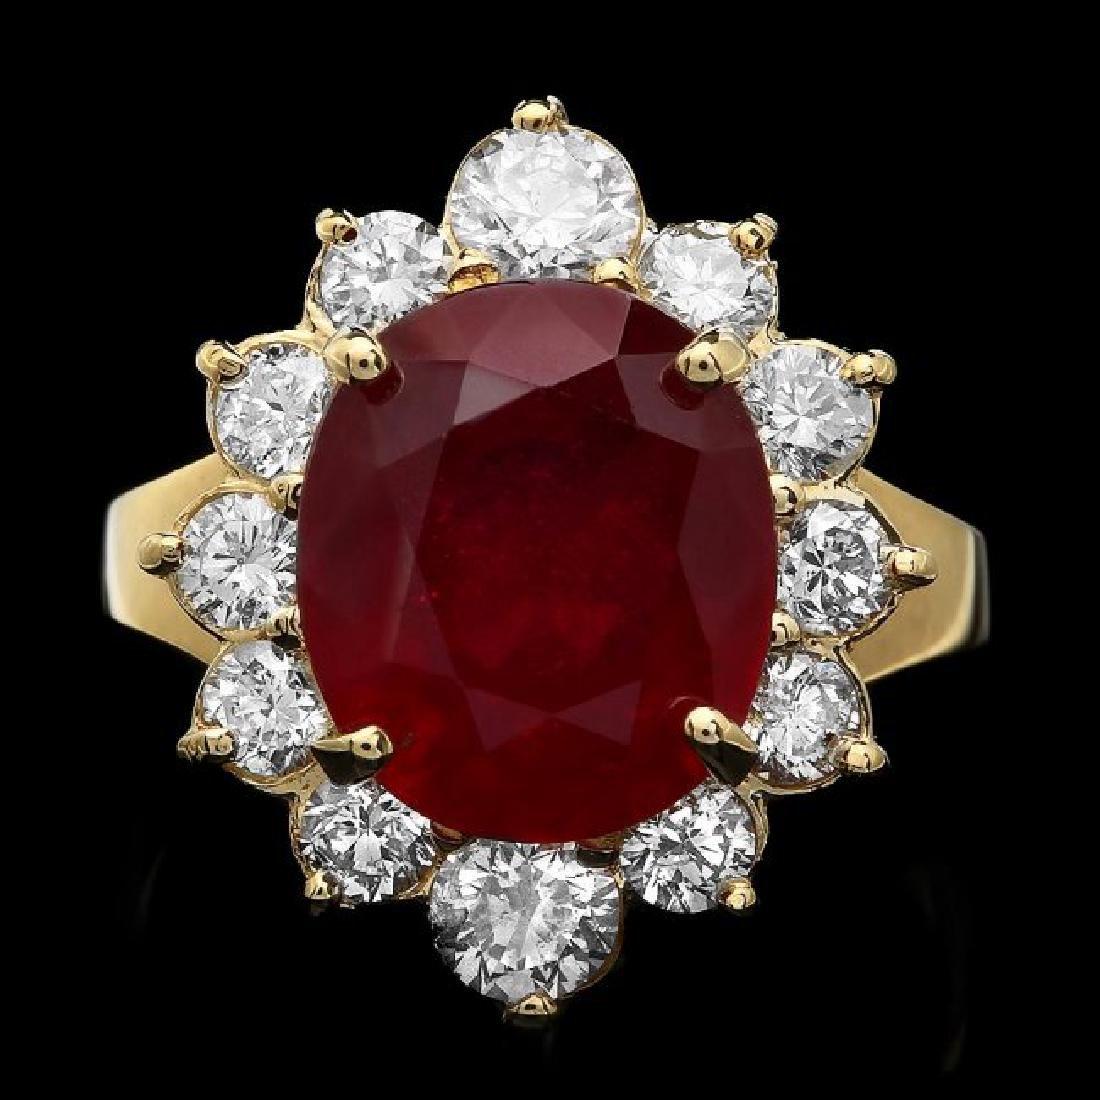 14k Yellow Gold 7.00ct Ruby 1.50ct Diamond Ring - 2